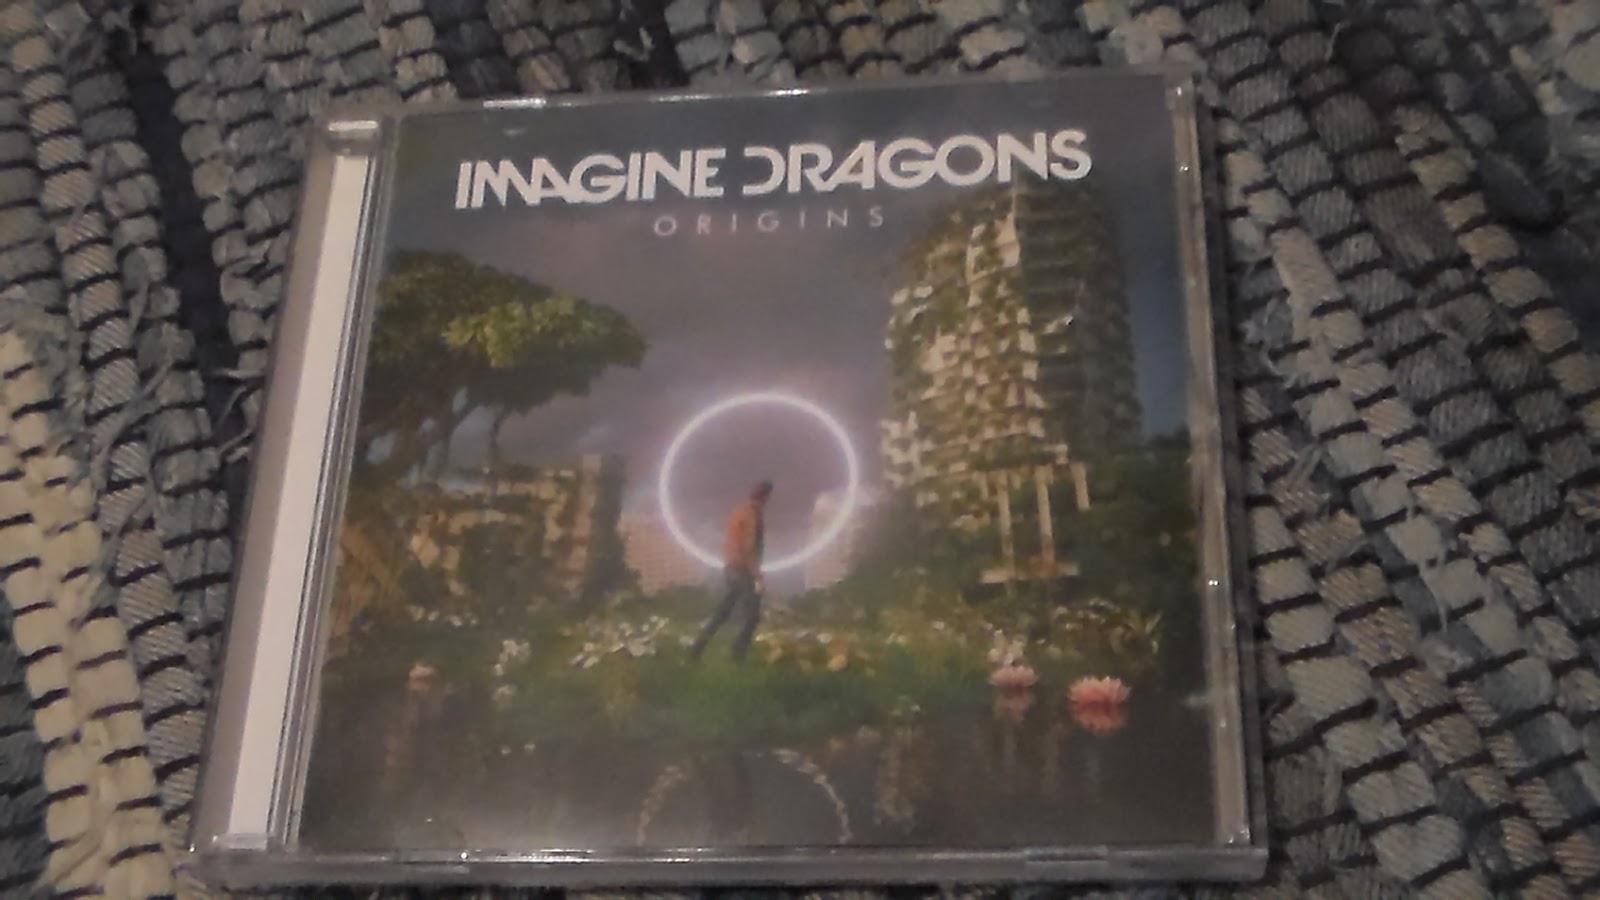 imagine dragons origins  Imagine Dragons' Origins